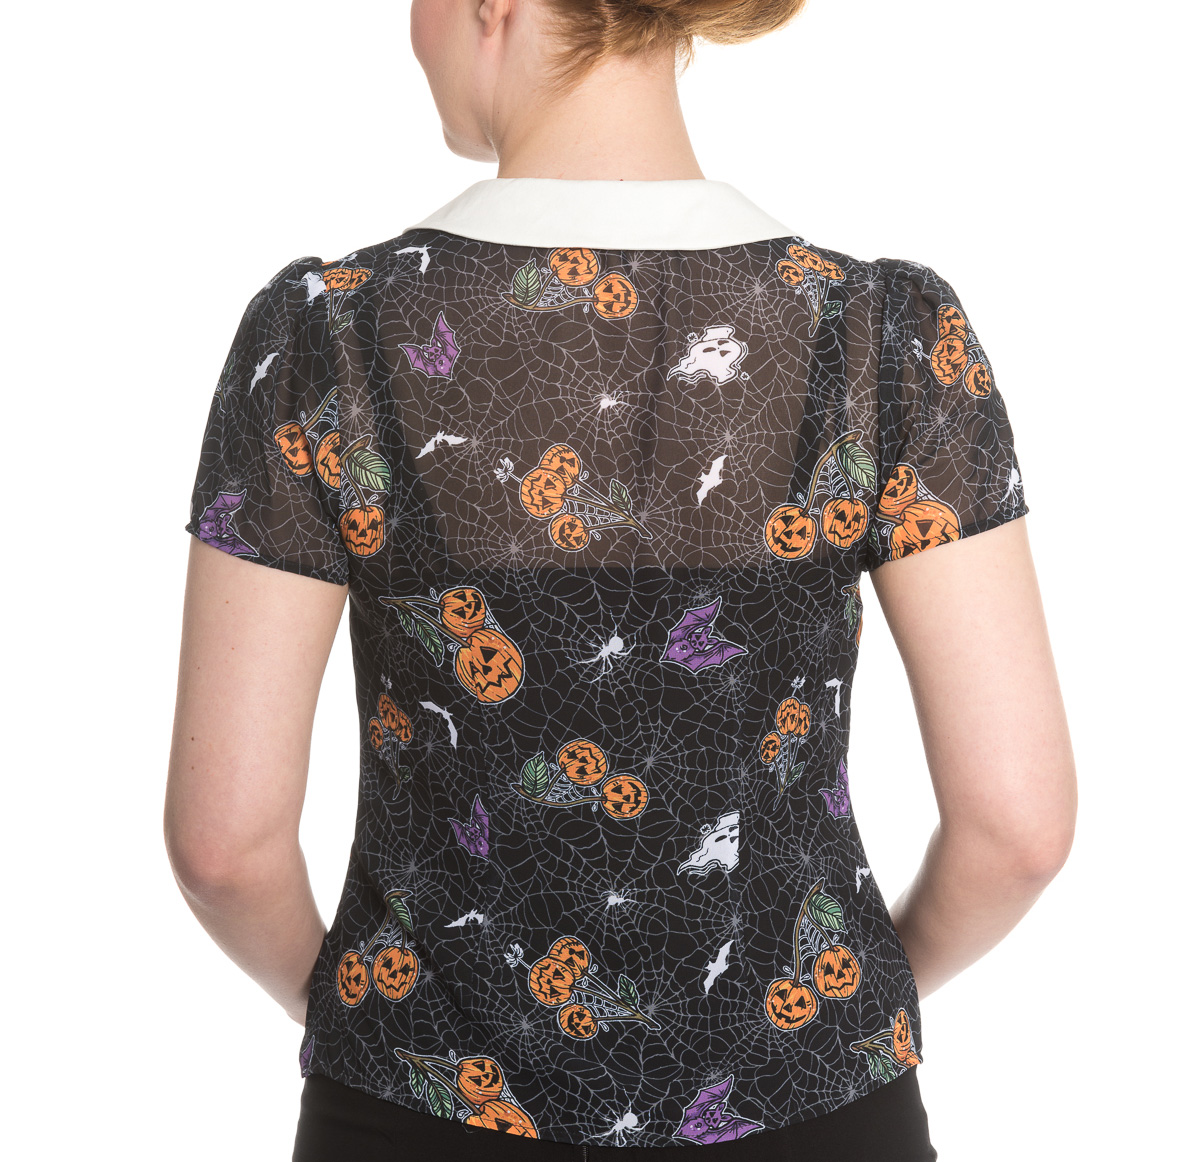 Hell-Bunny-Shirt-Top-Halloween-Webs-Pumpkins-HARLOW-Blouse-All-Sizes thumbnail 17